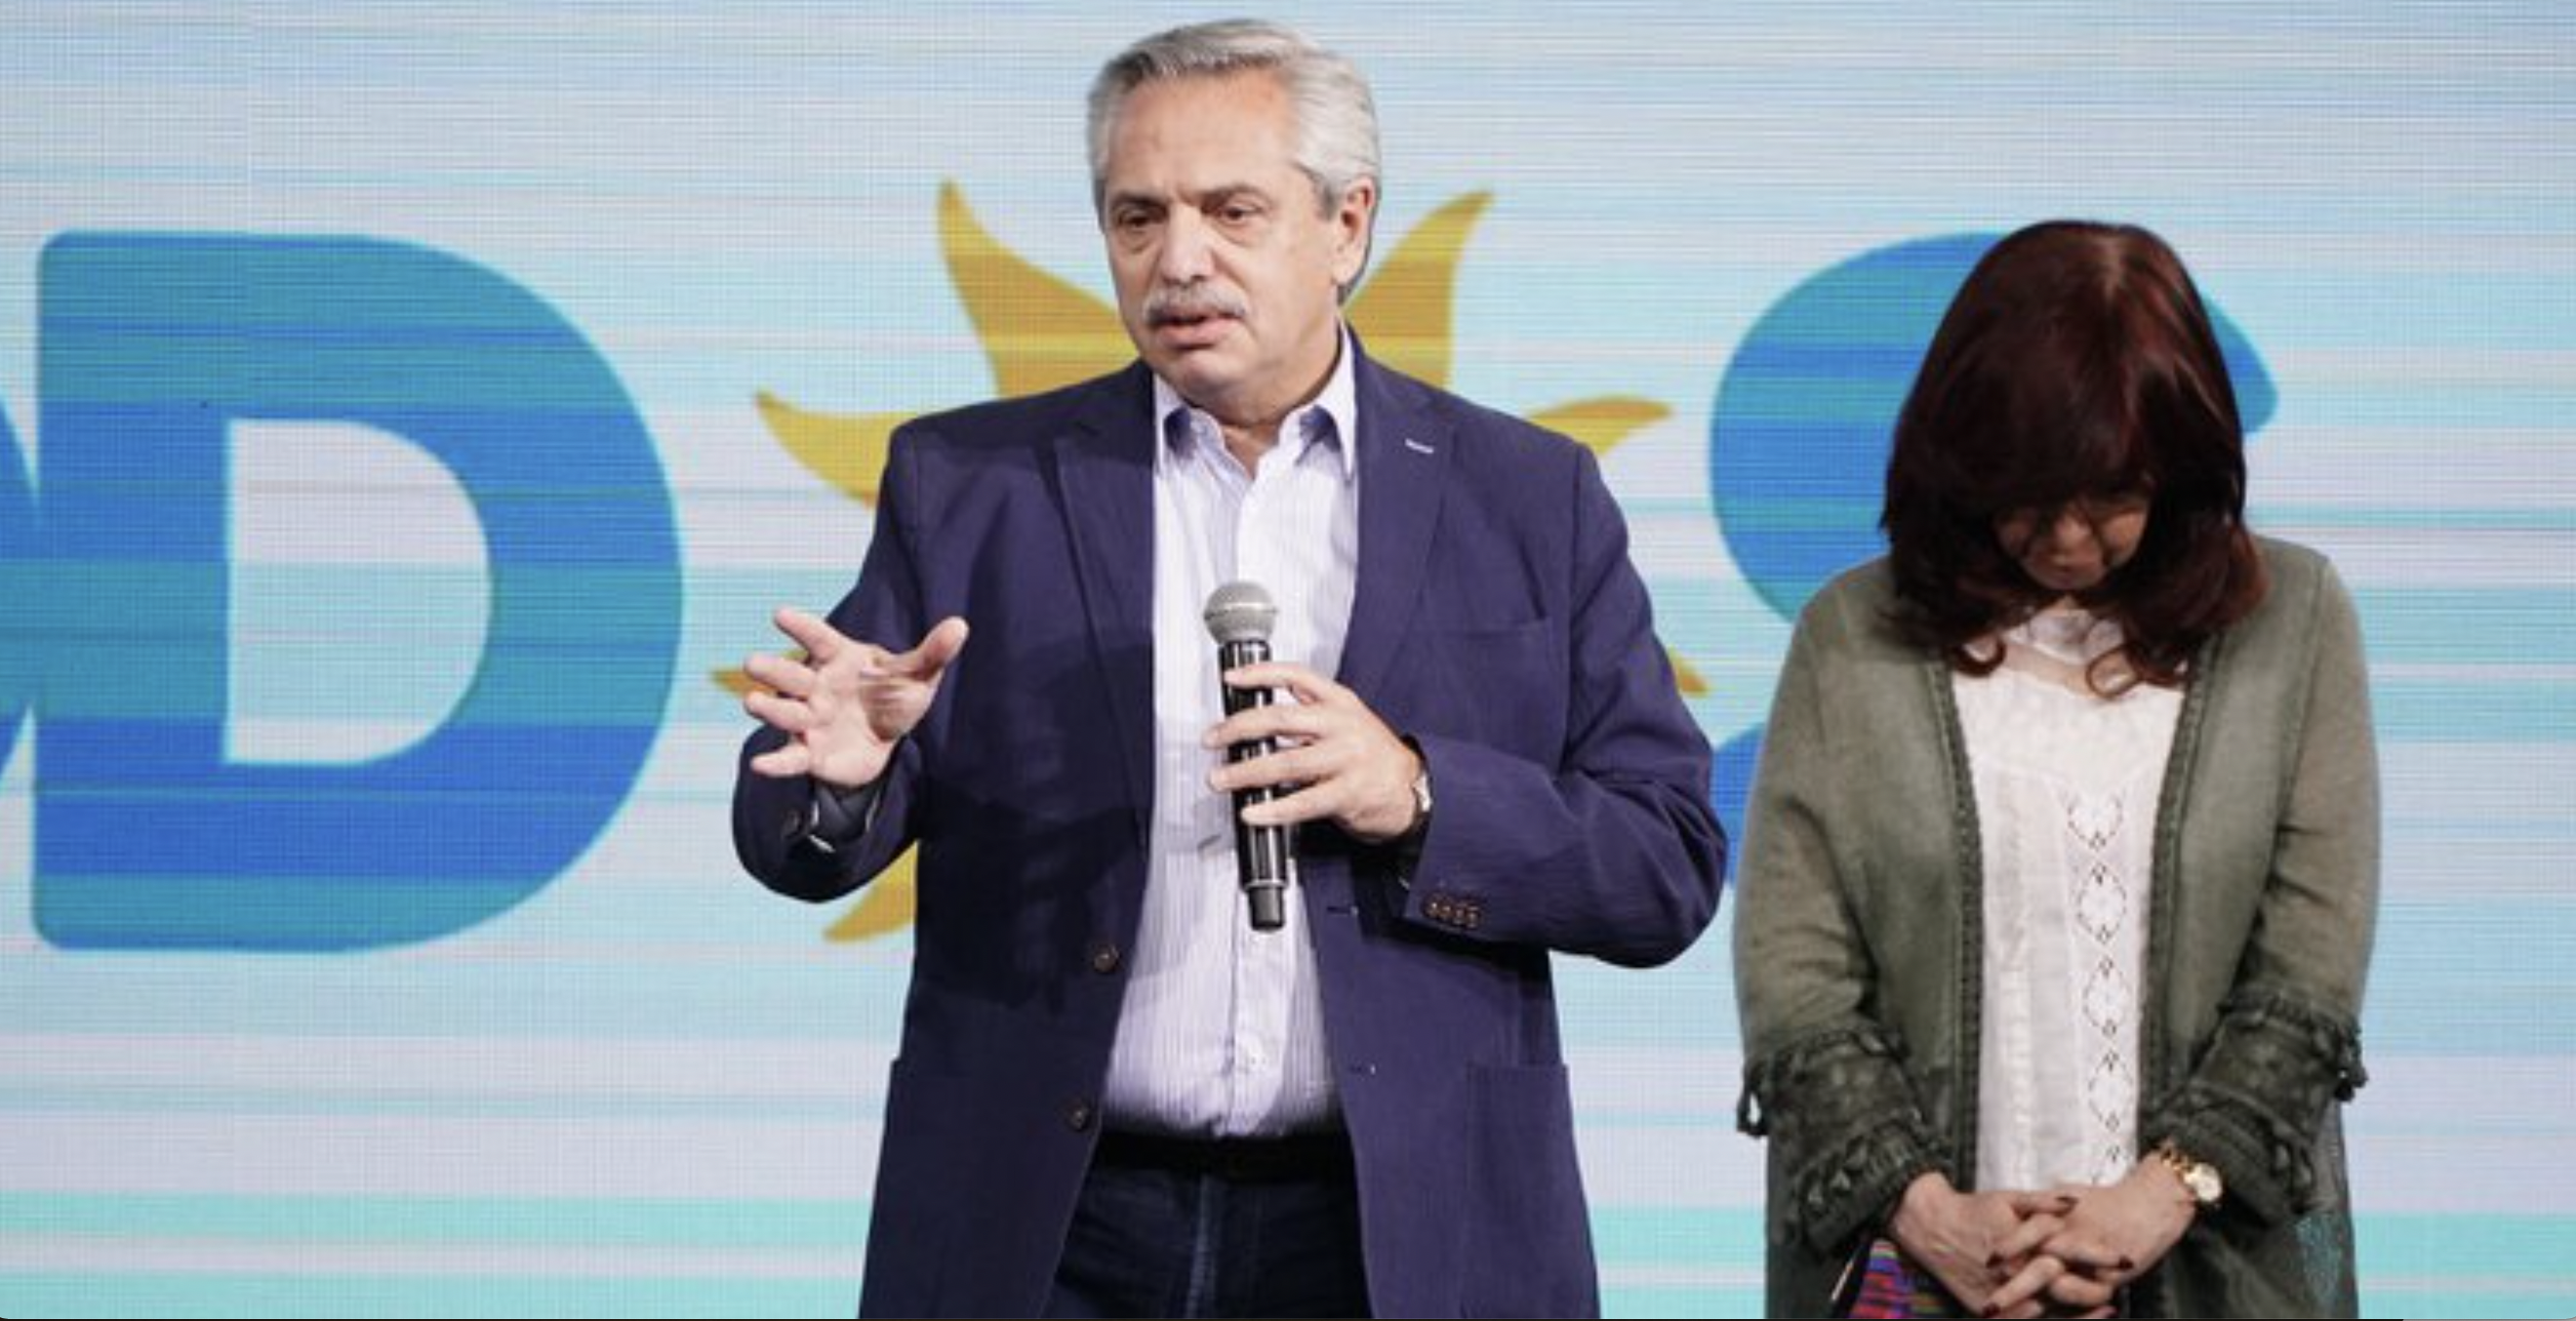 argentina: contundente derrota del gobierno de alberto fernandez y cristina kirchner